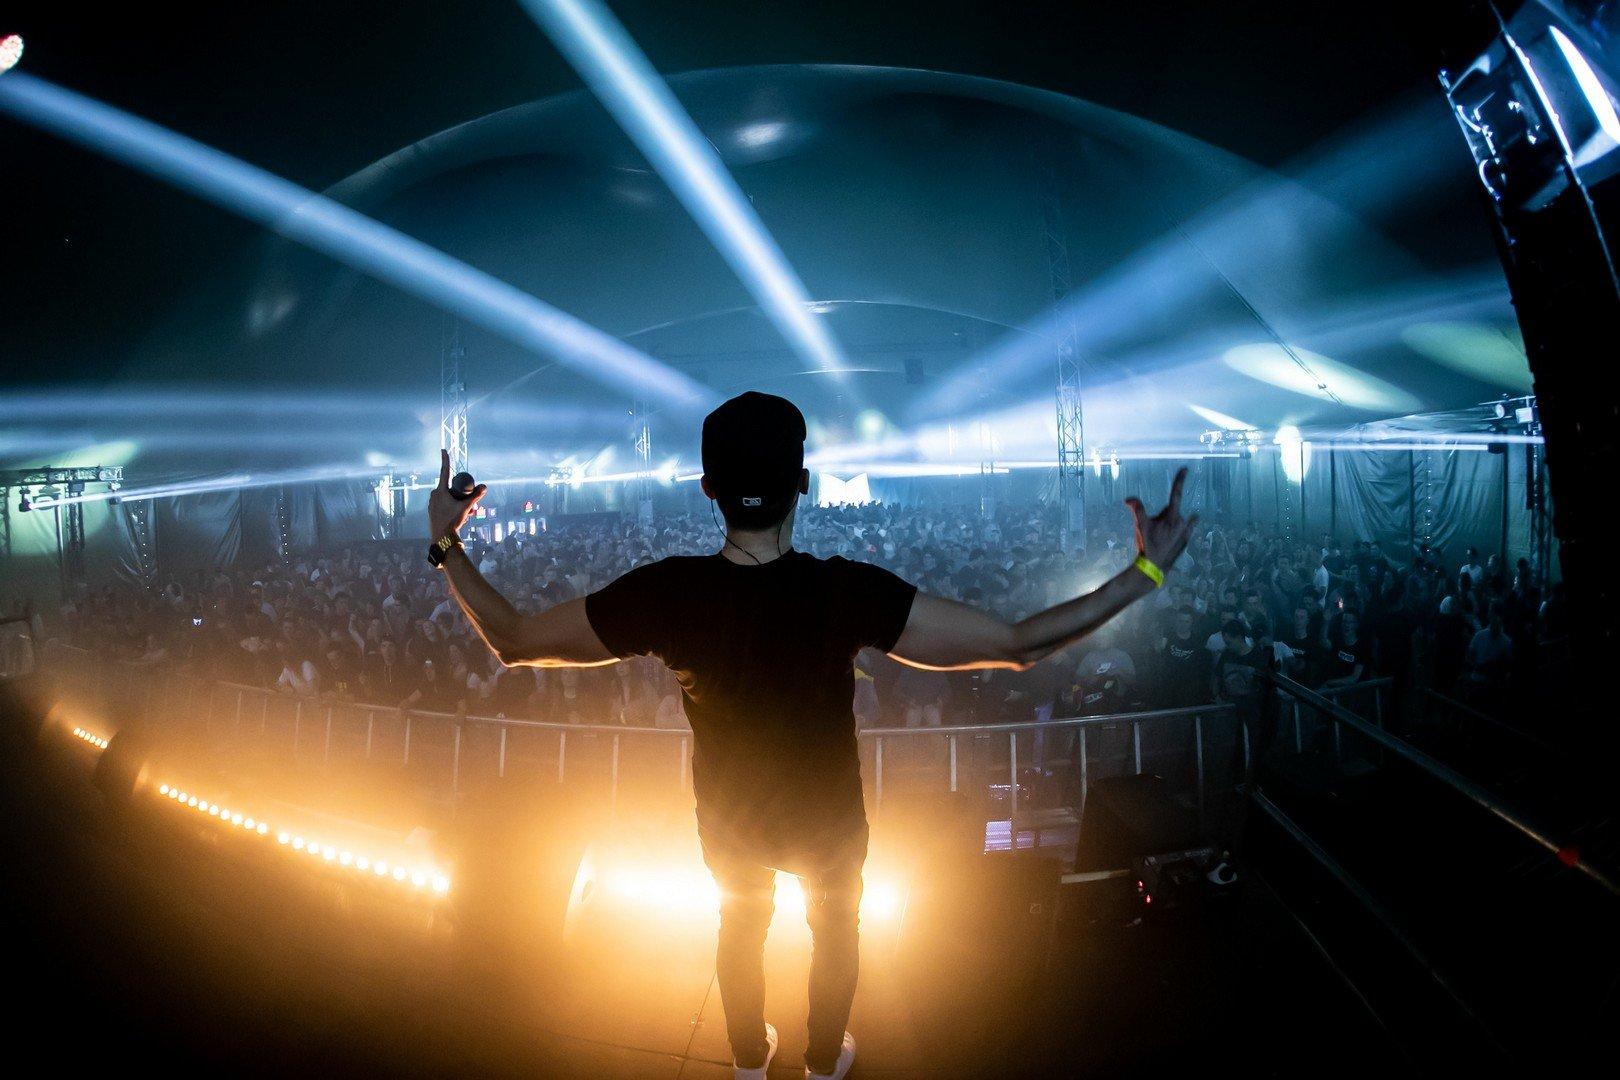 10de 'Replay' en 'Afterwork Festival' lokken 7000 mensen - Replay 4